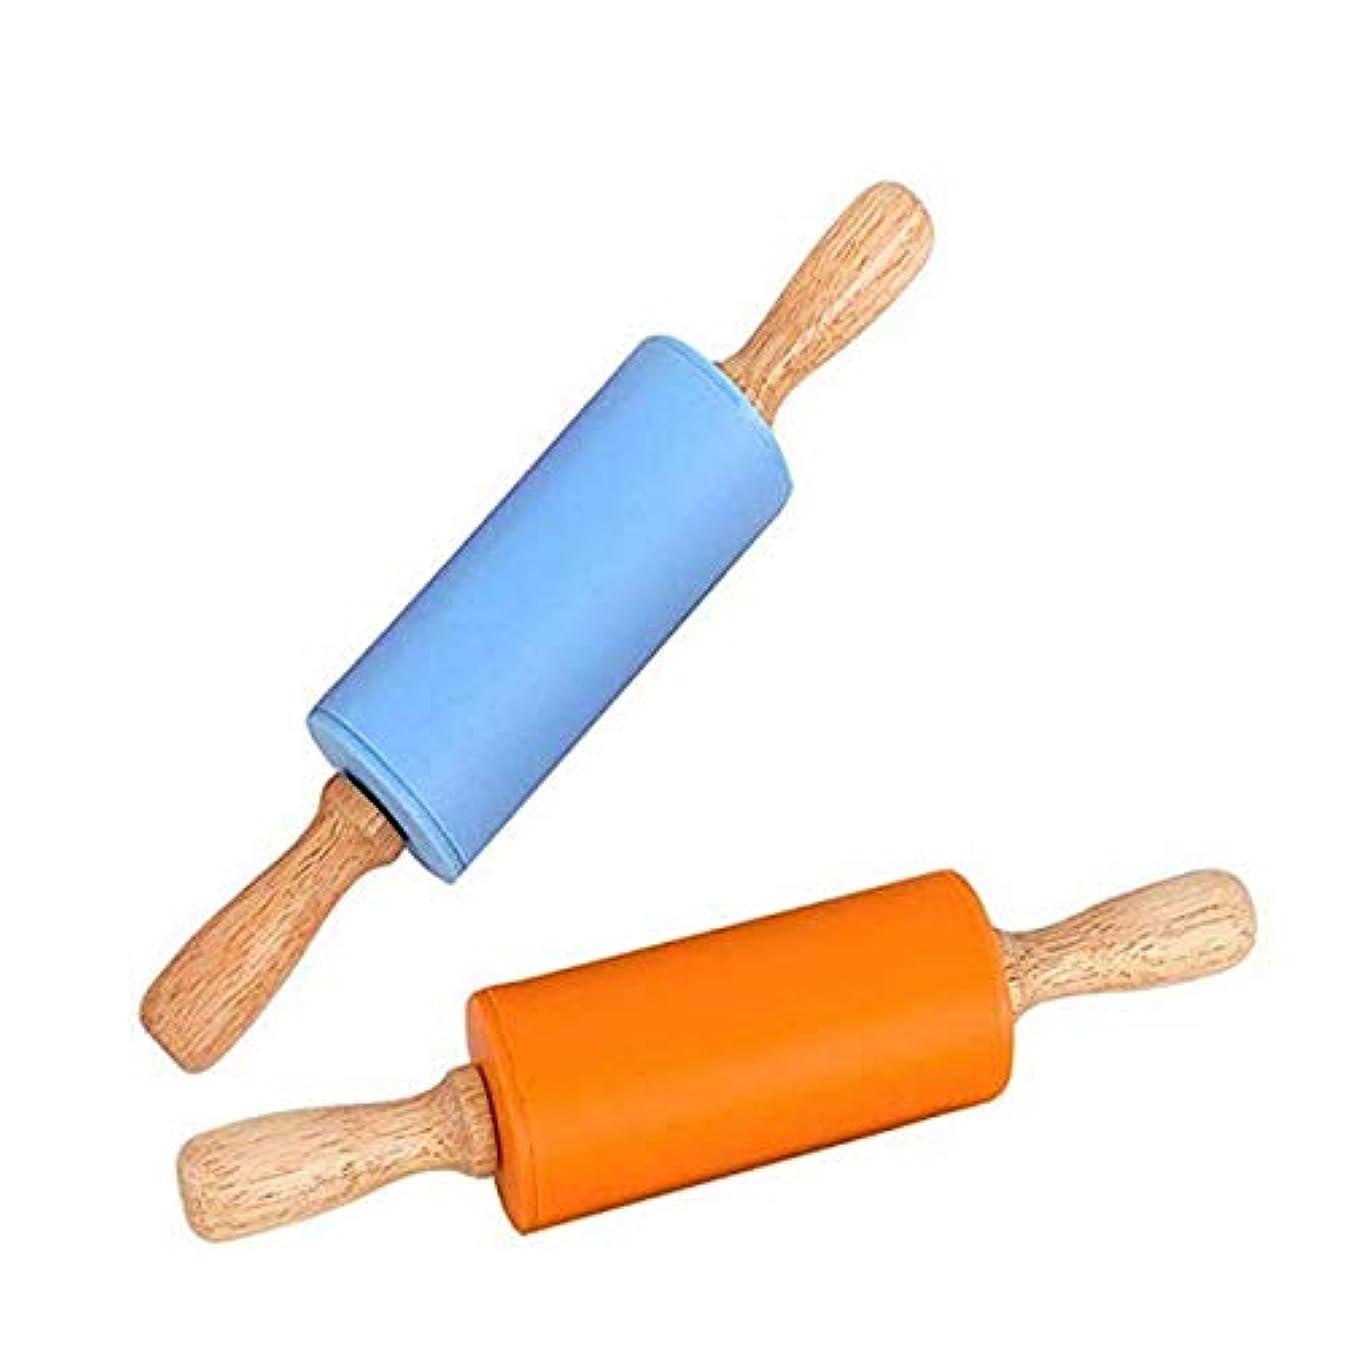 Mini Rolling Pin, 2 Pack Kids Size Wooden Handle Rolling Pin Non-Stick Silicone Rolling Pins for Home Kitchen Children Cake 9 Inch by Koogel